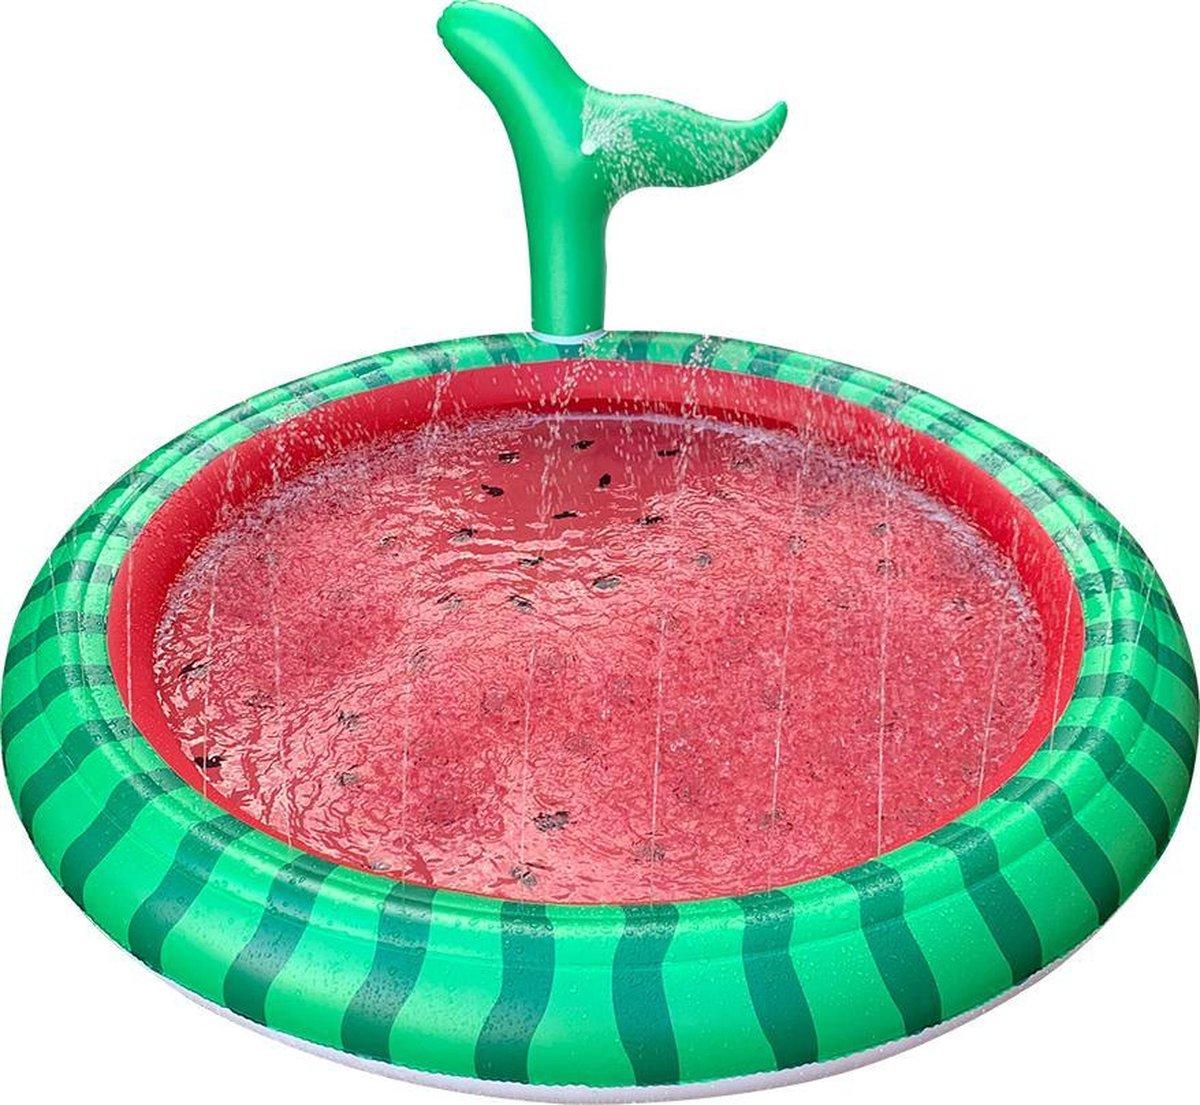 Watermat Watermeloen XL - Speelmat - 170 CM - Waterspeelgoed - Fontein